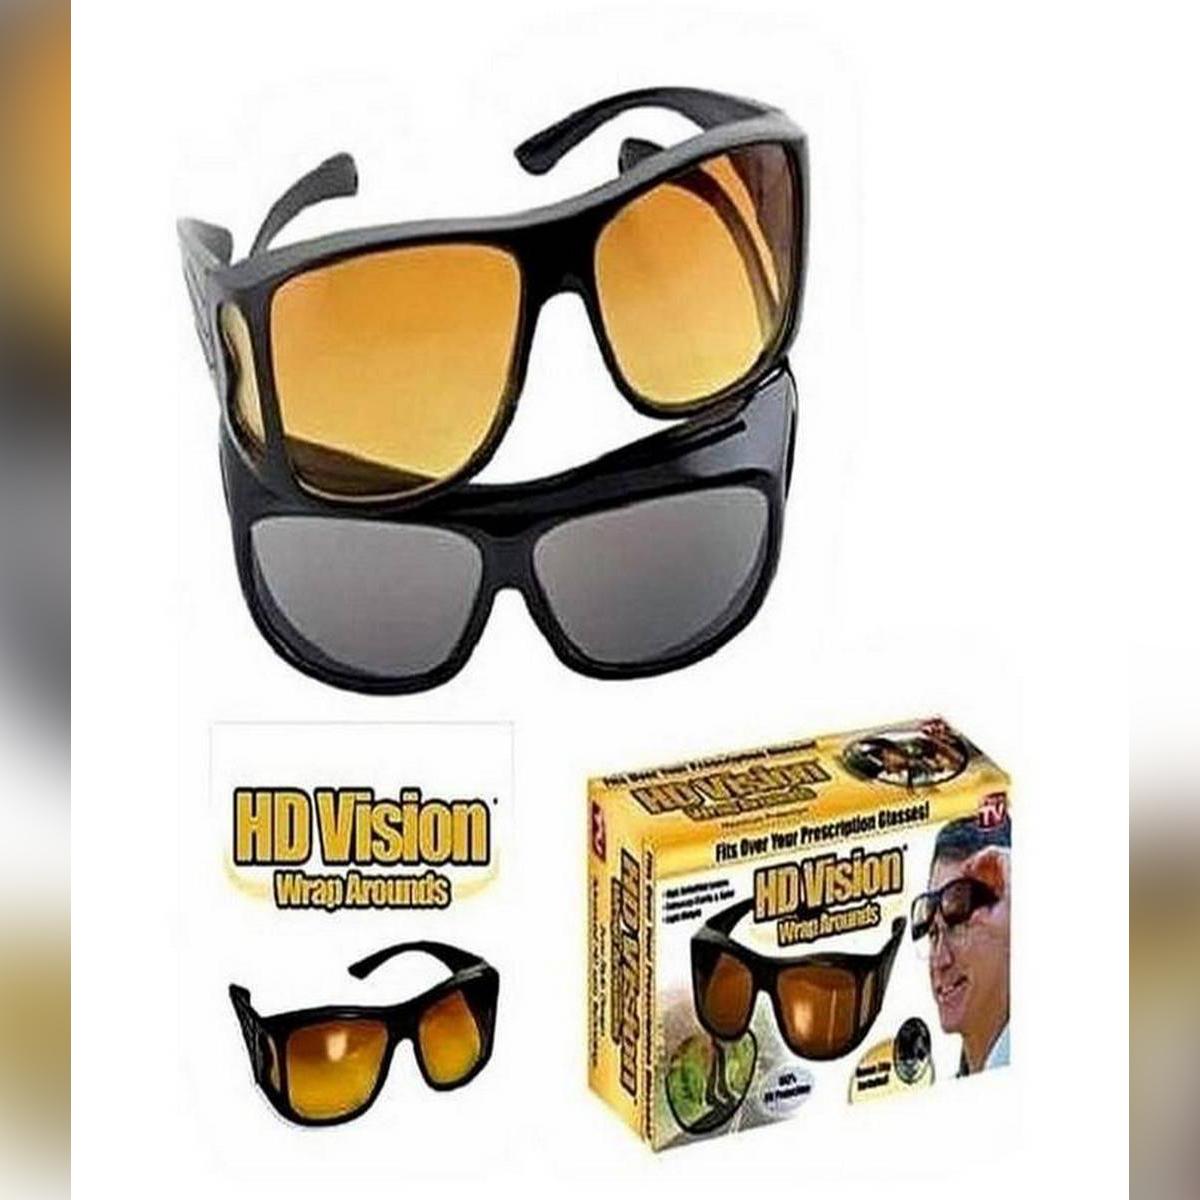 Deemiz Black & Yellow 2 HD Vision Sun Glasses